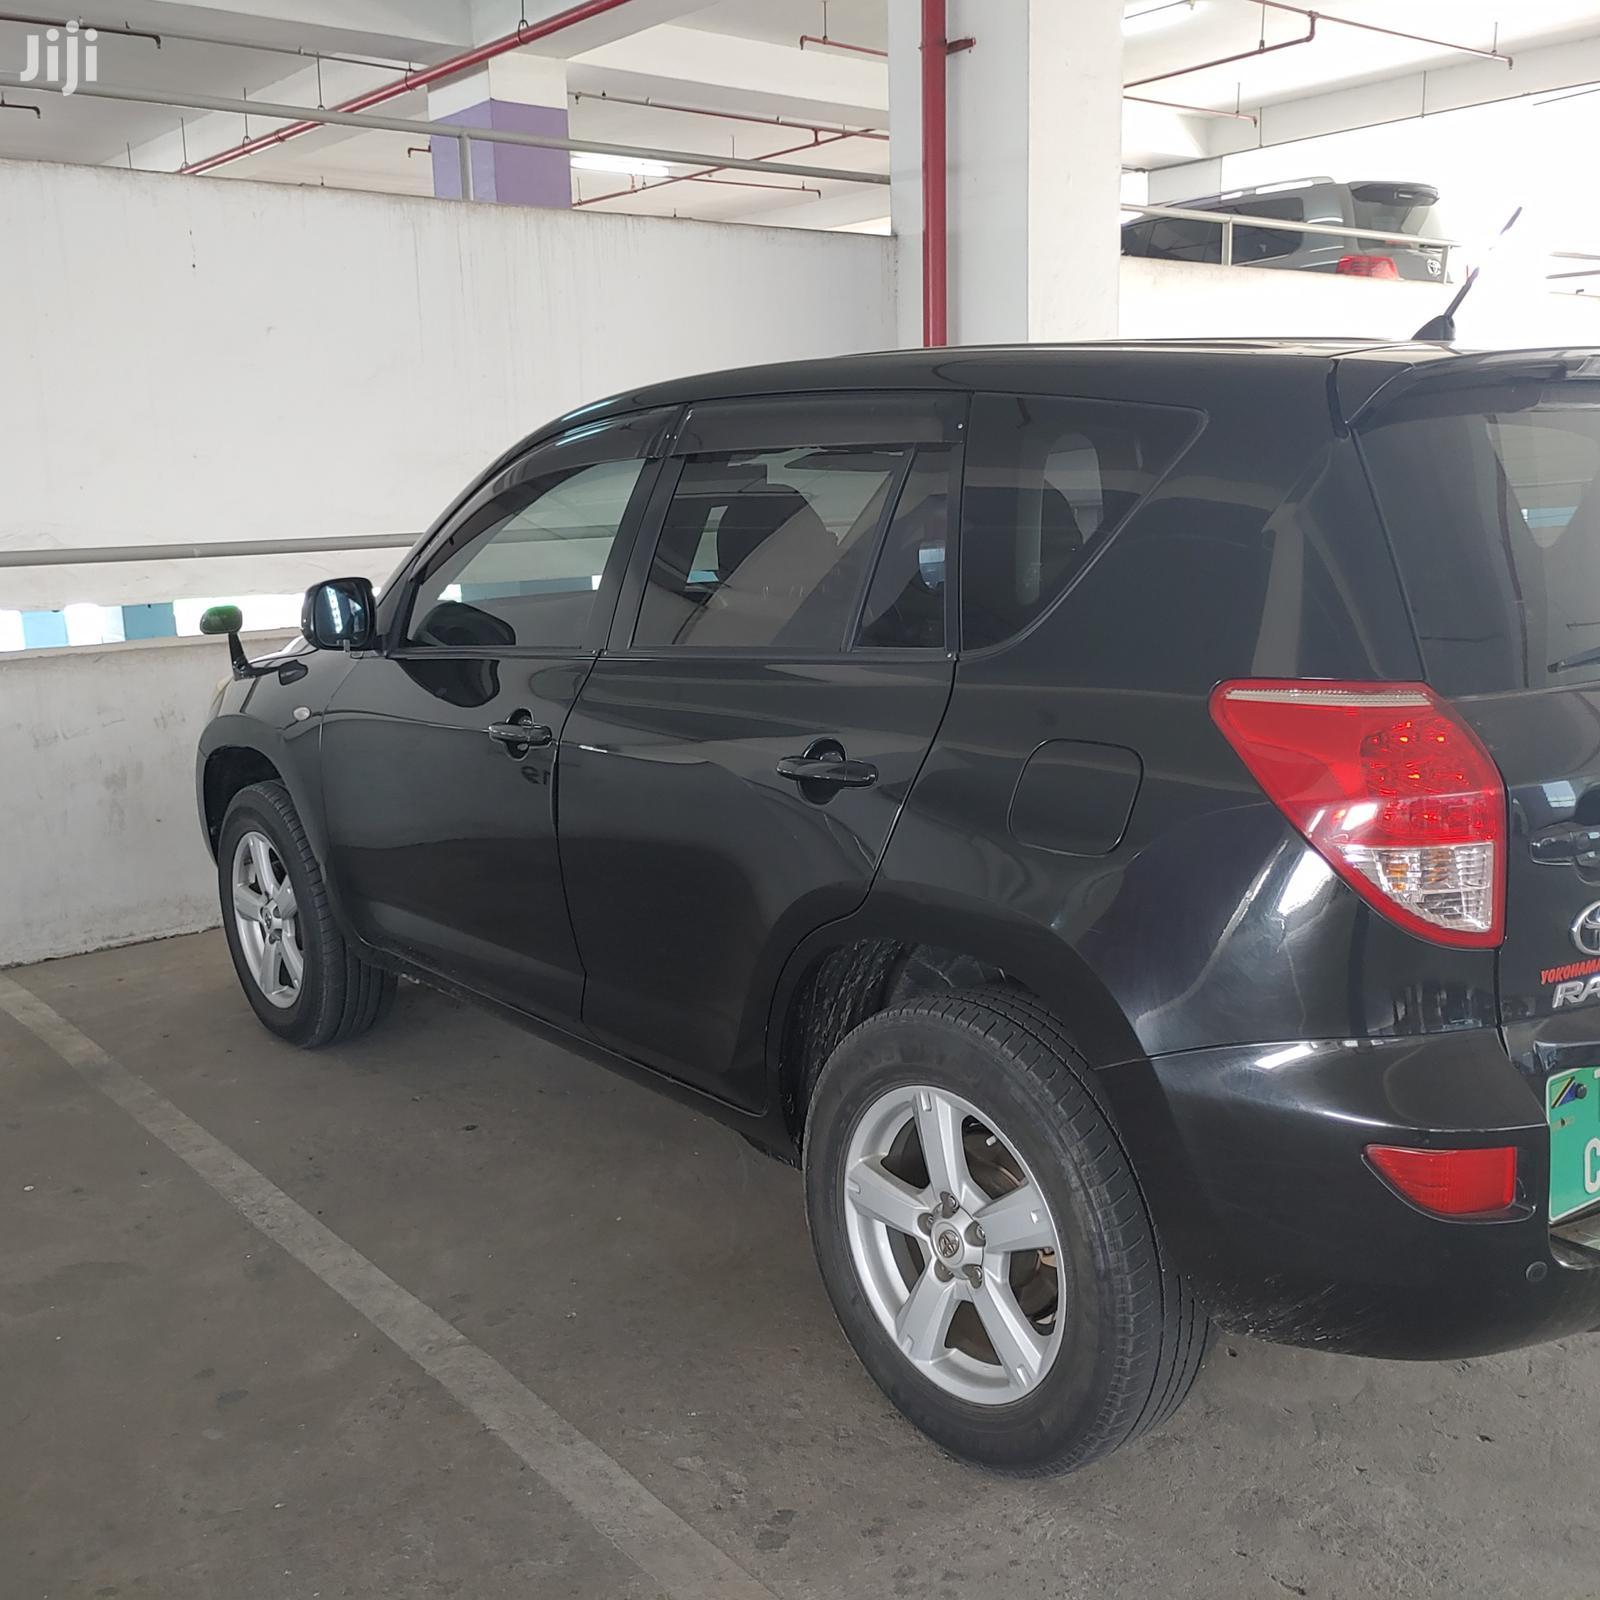 Toyota RAV4 2006 Black | Cars for sale in Kinondoni, Dar es Salaam, Tanzania